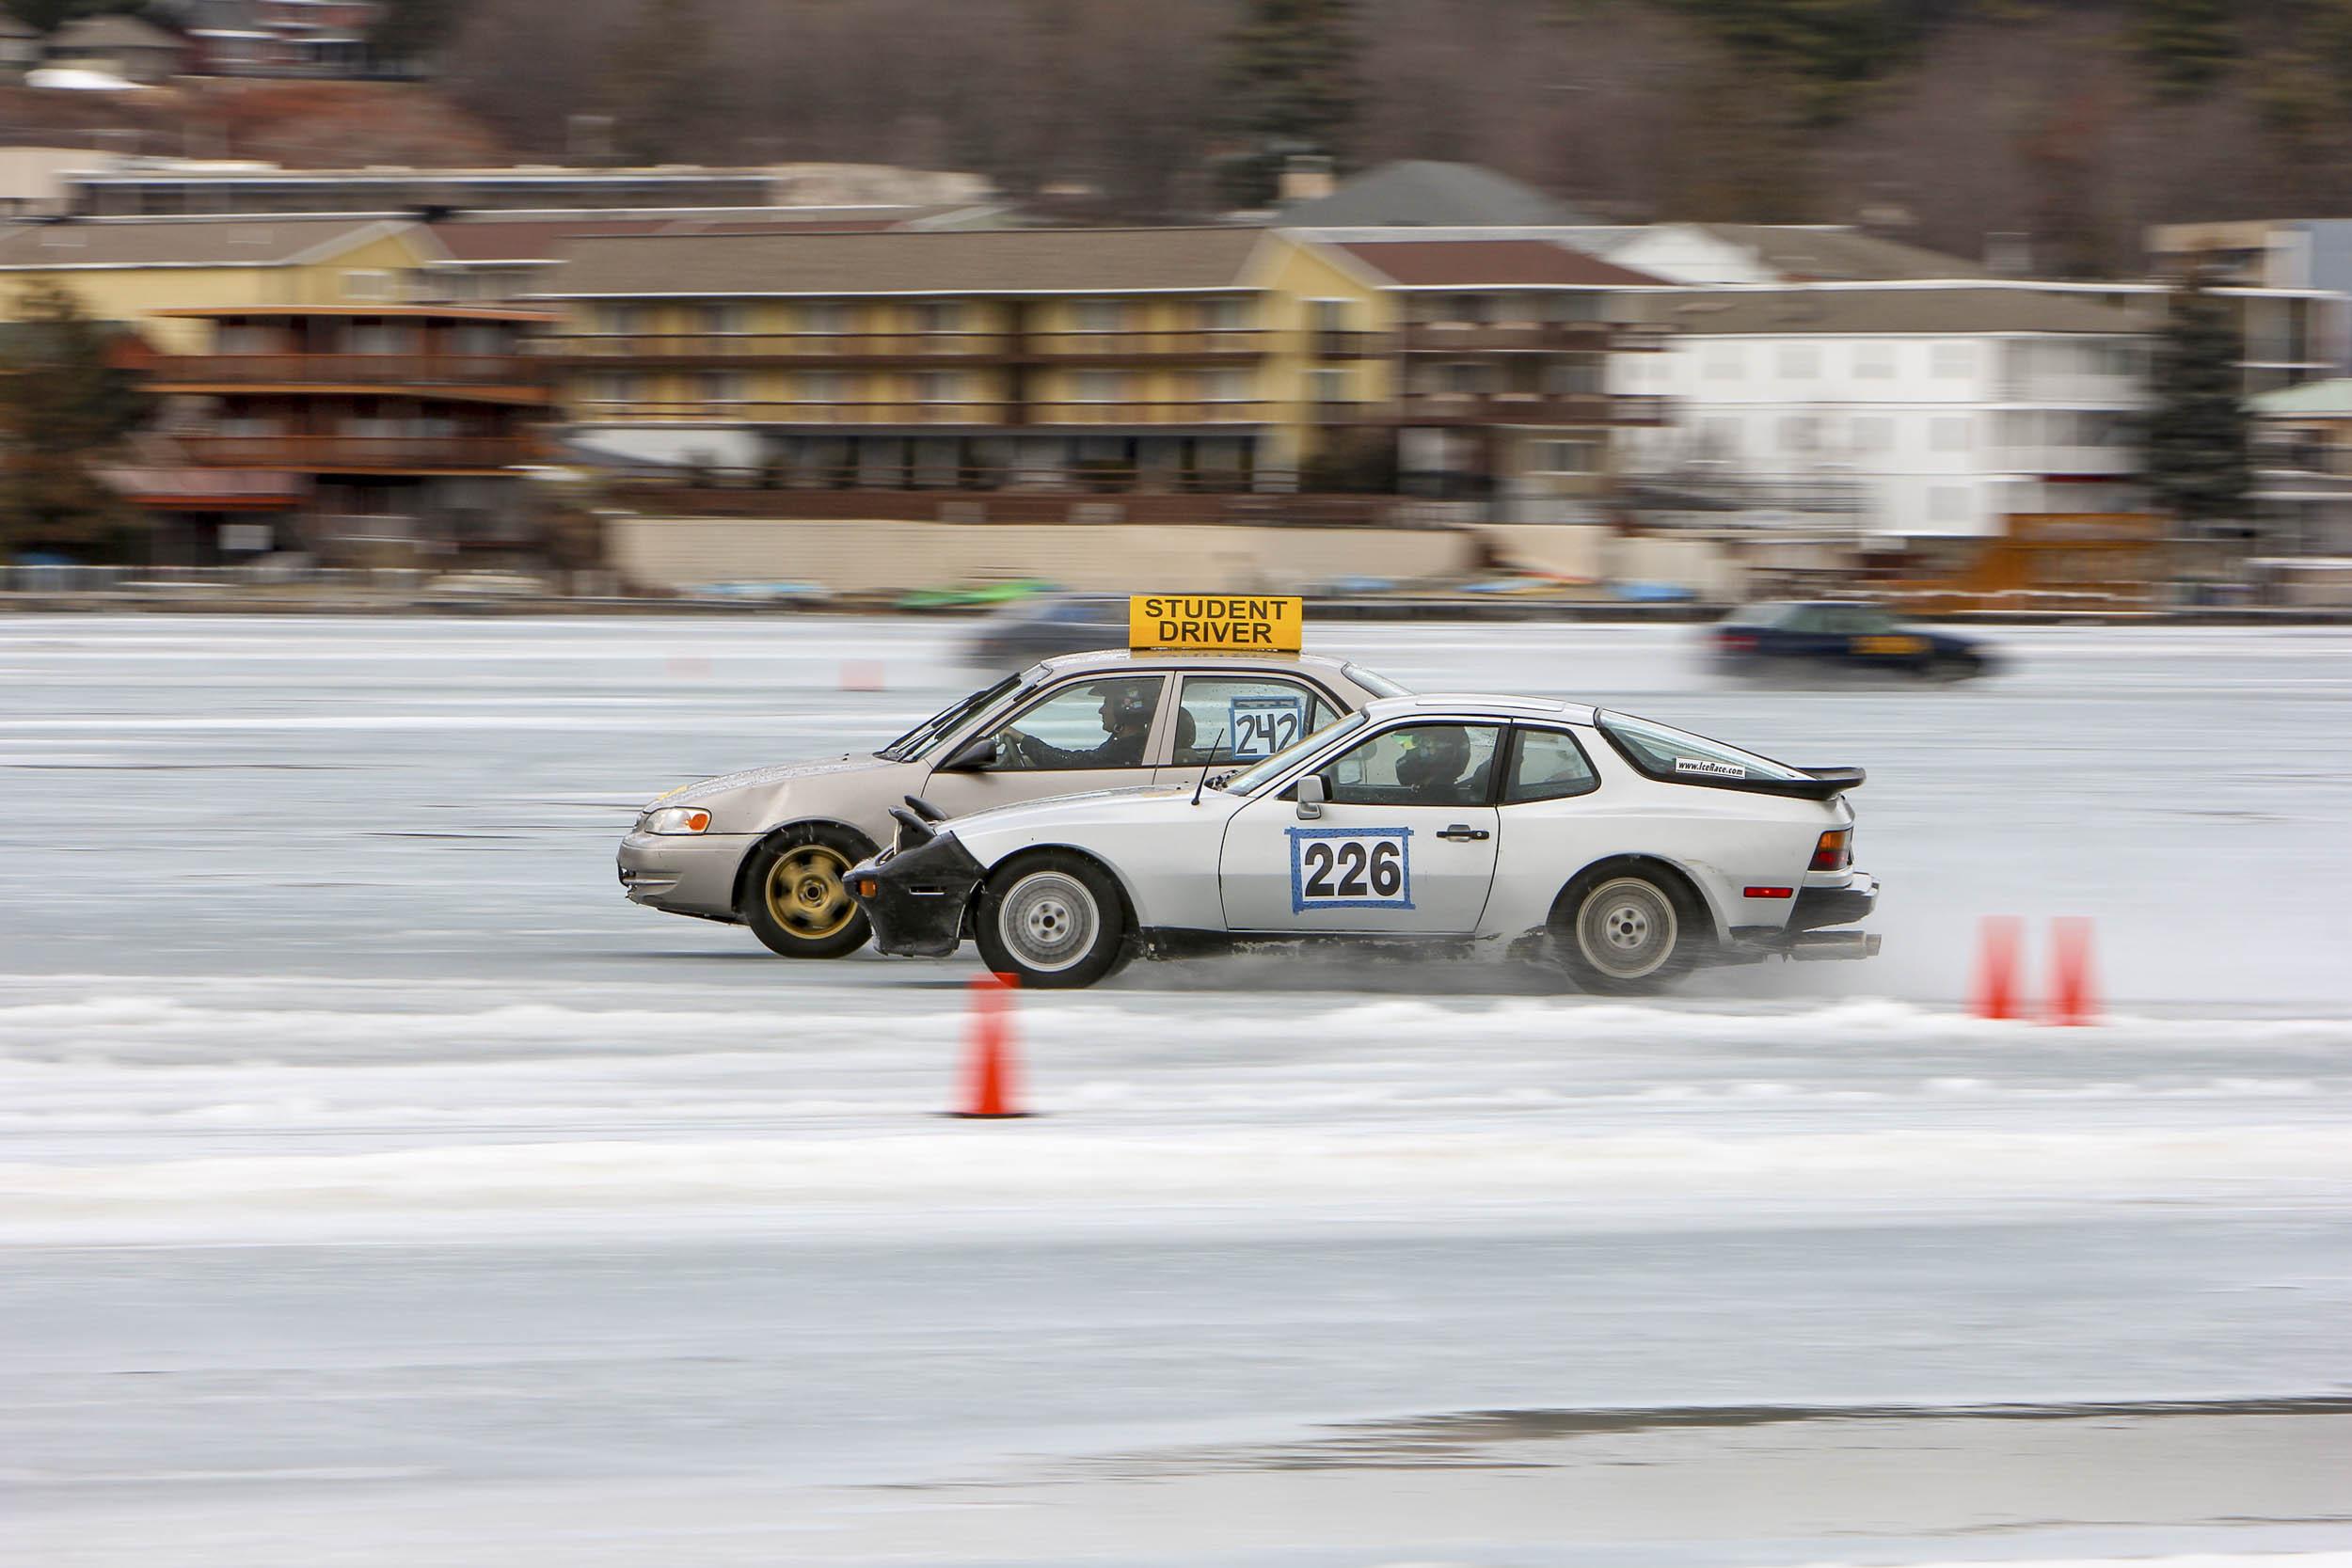 Student Driver ice racing